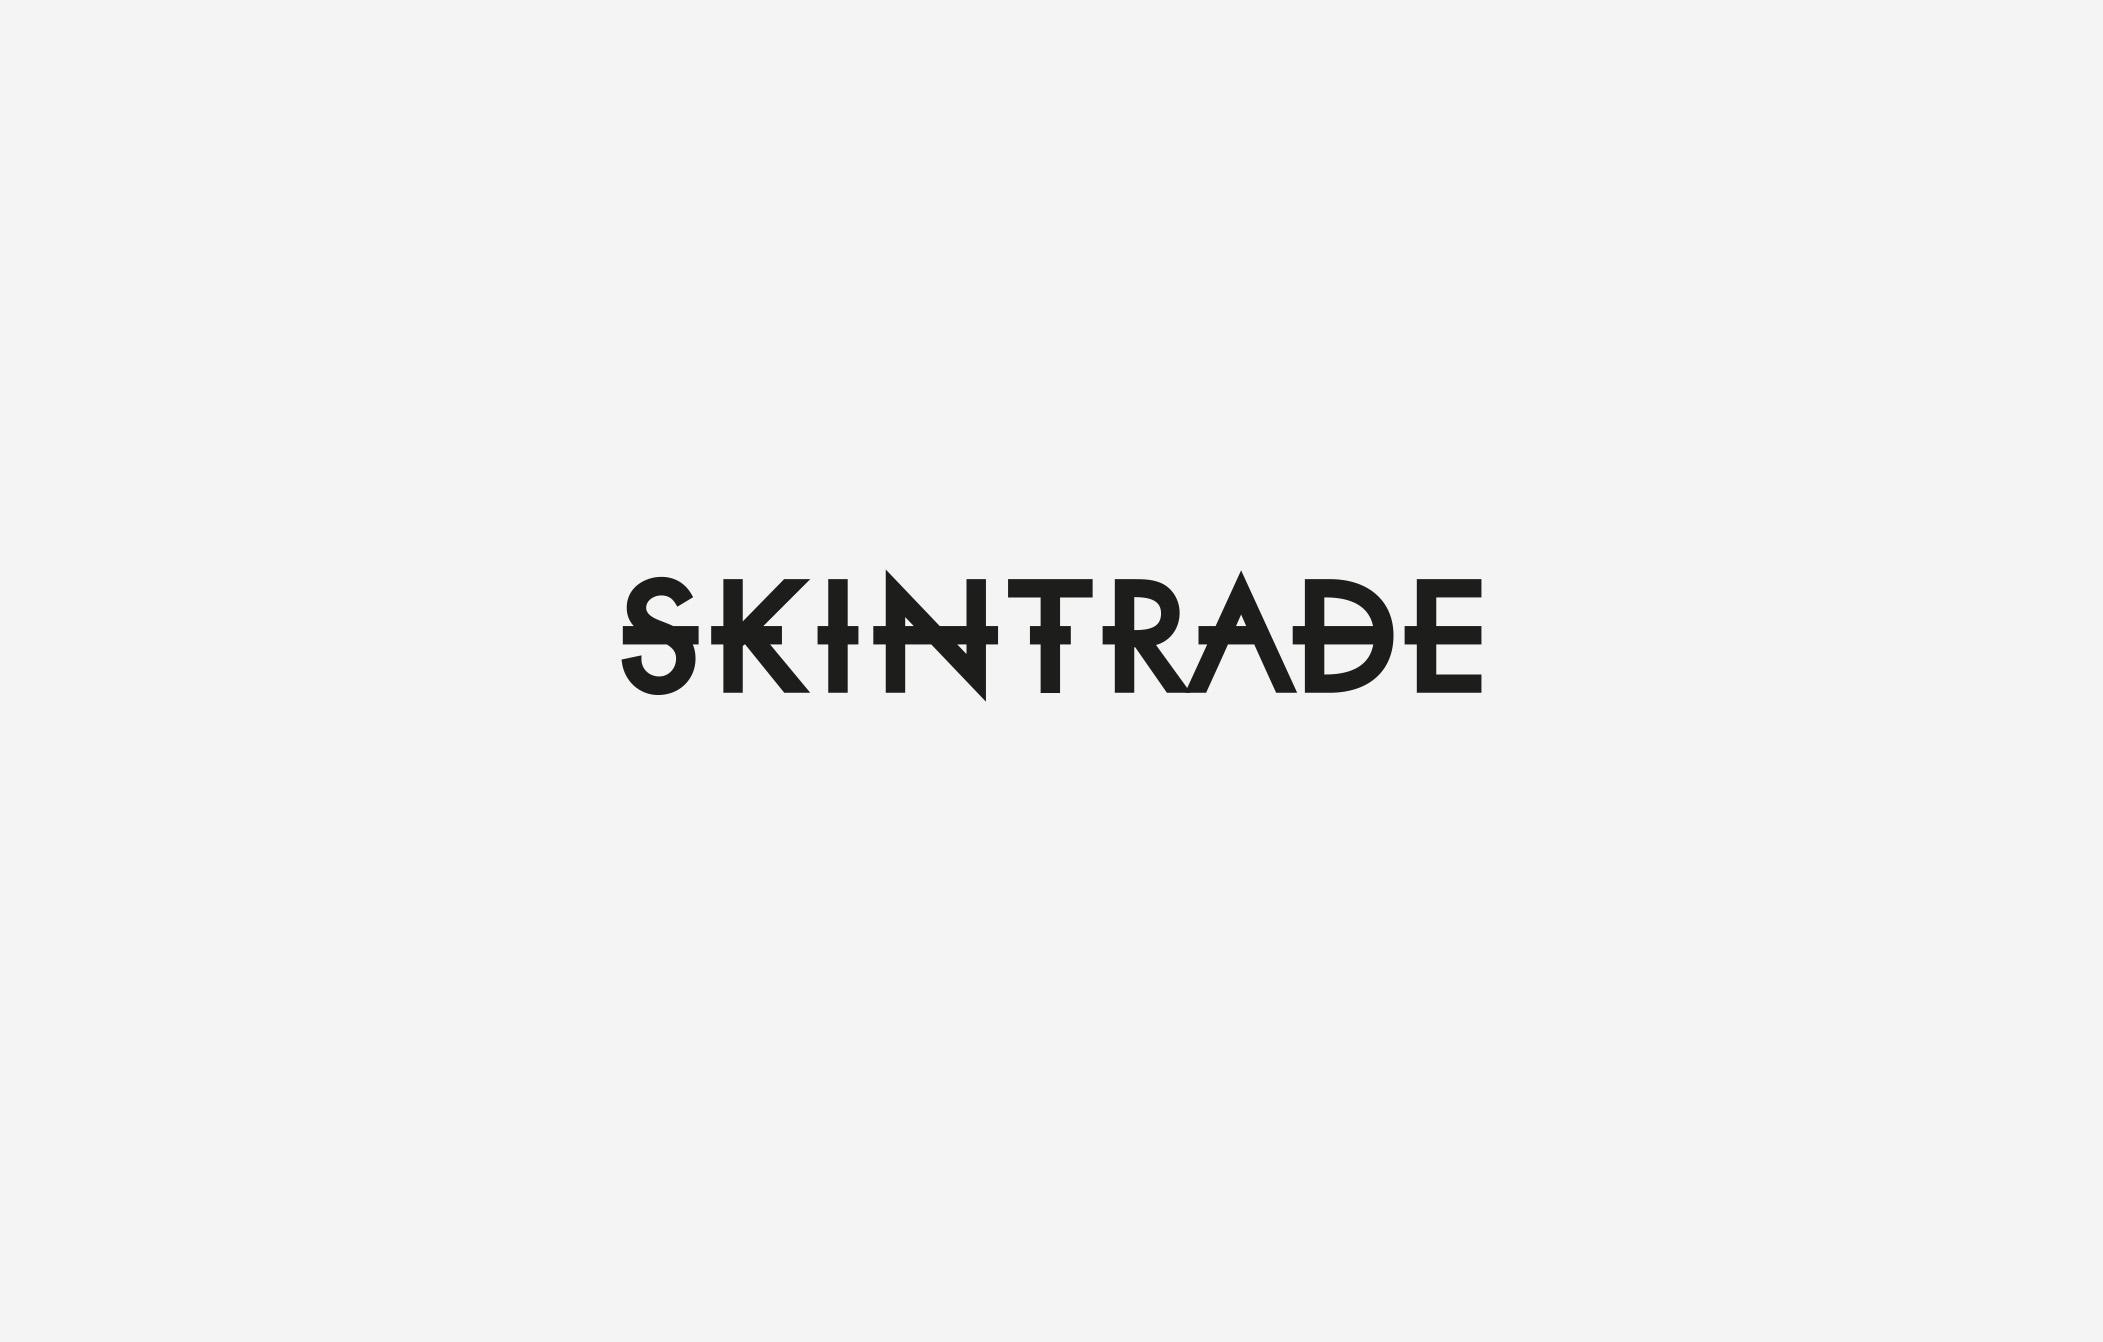 Skintrade.jpg